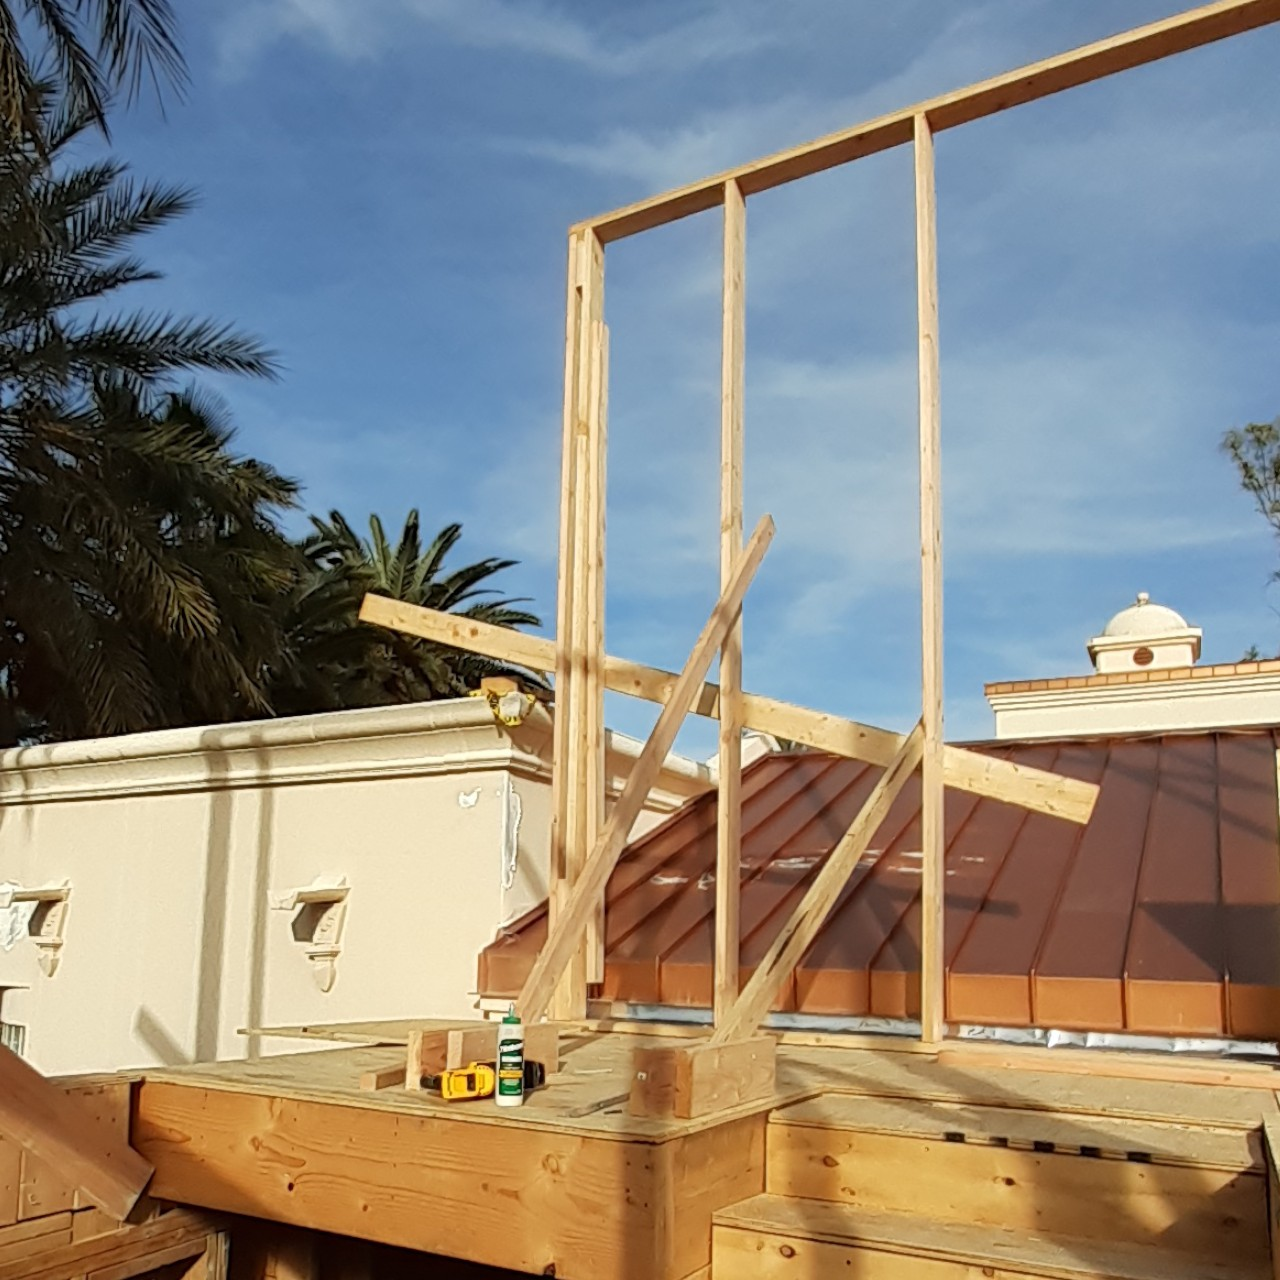 carpentry-wood-framing-second-floor-home-addition--framing-72